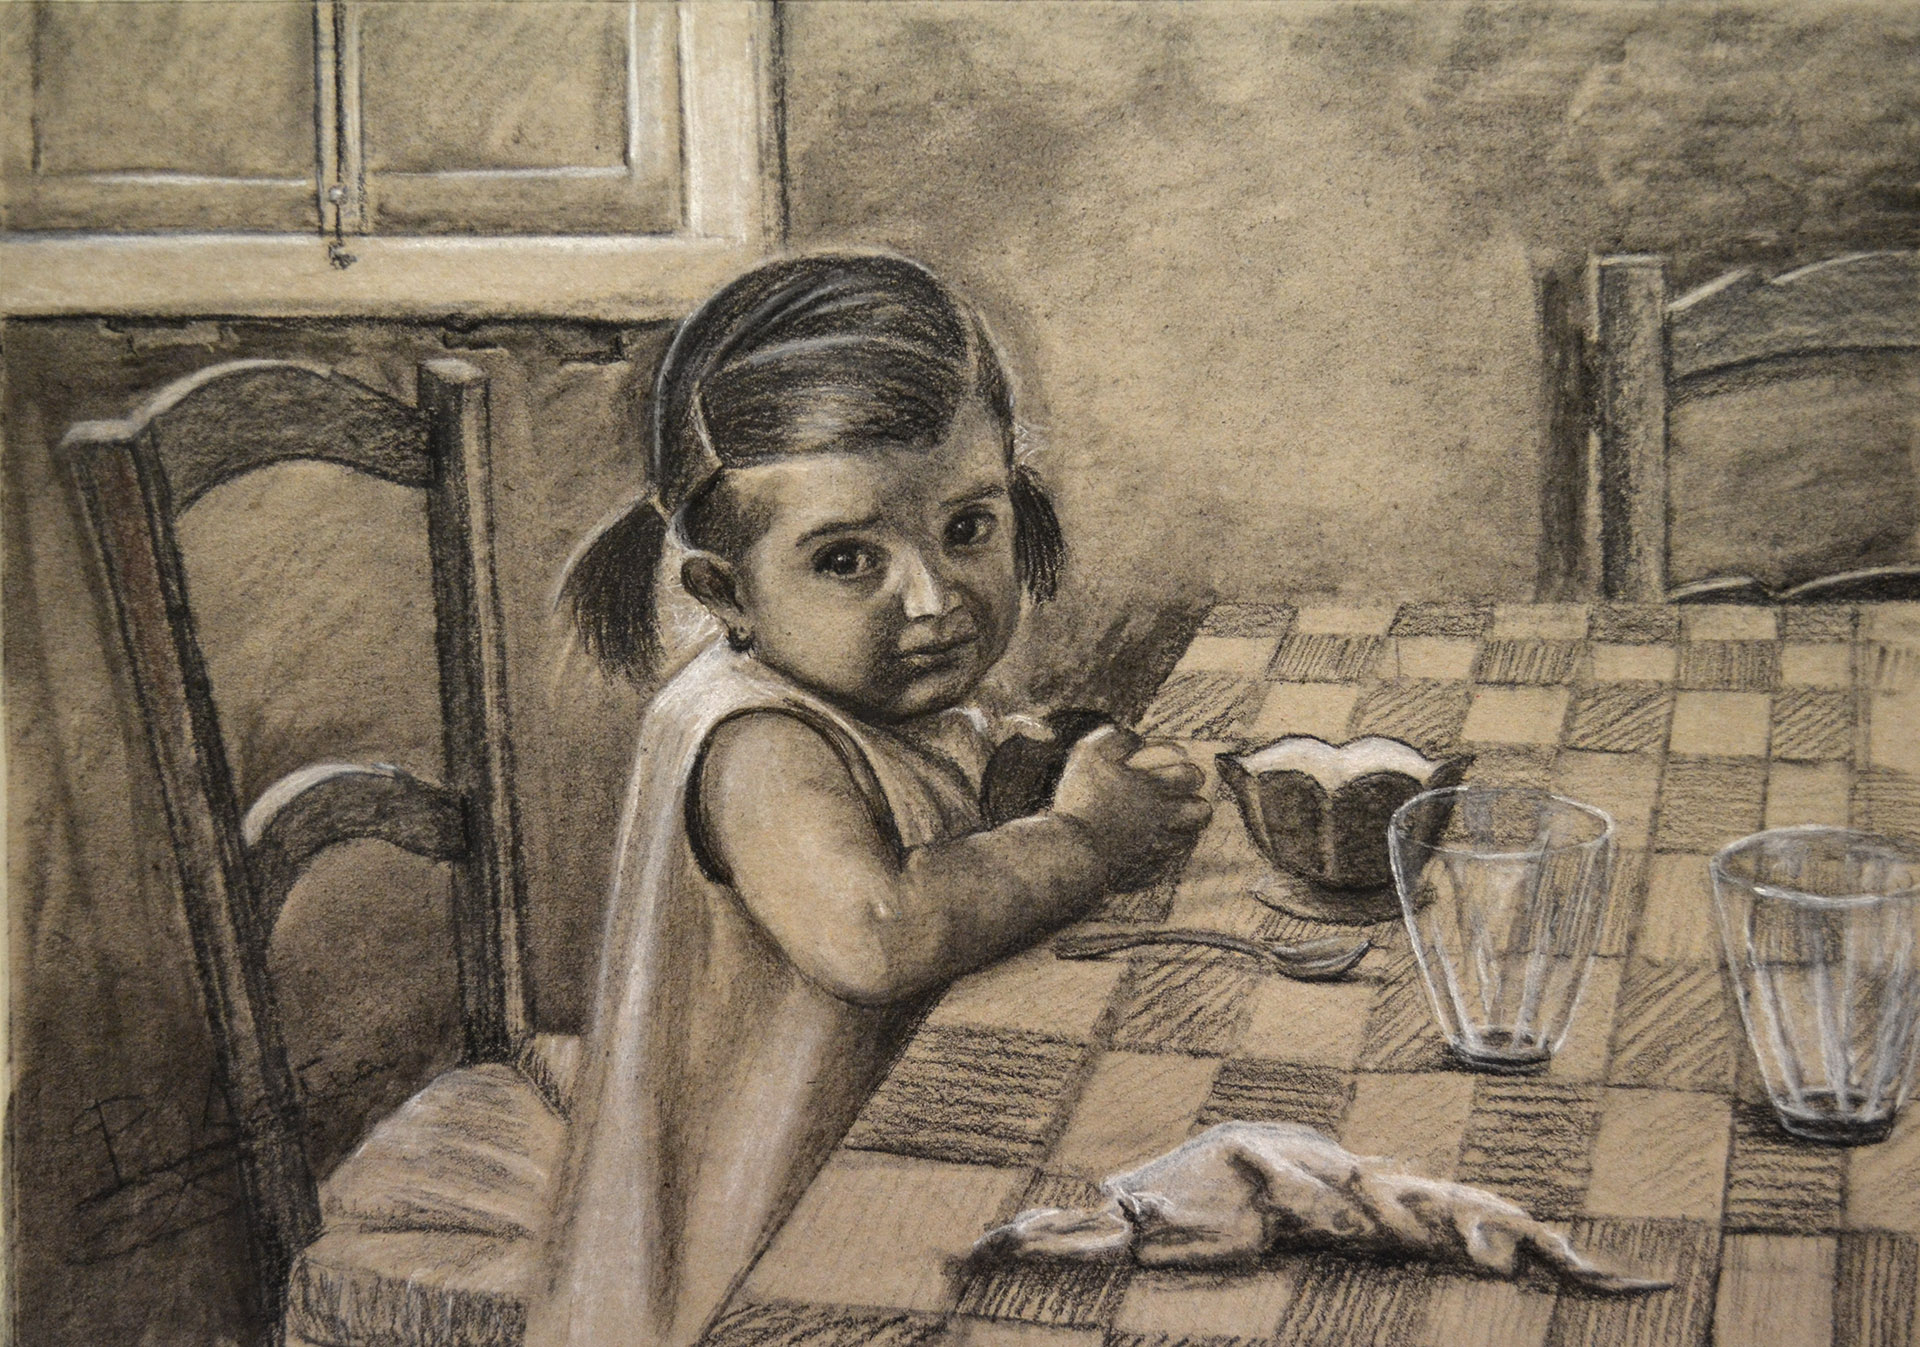 Carboncillo, Pilar Aceña. 42 x 30 cm. Año 2018